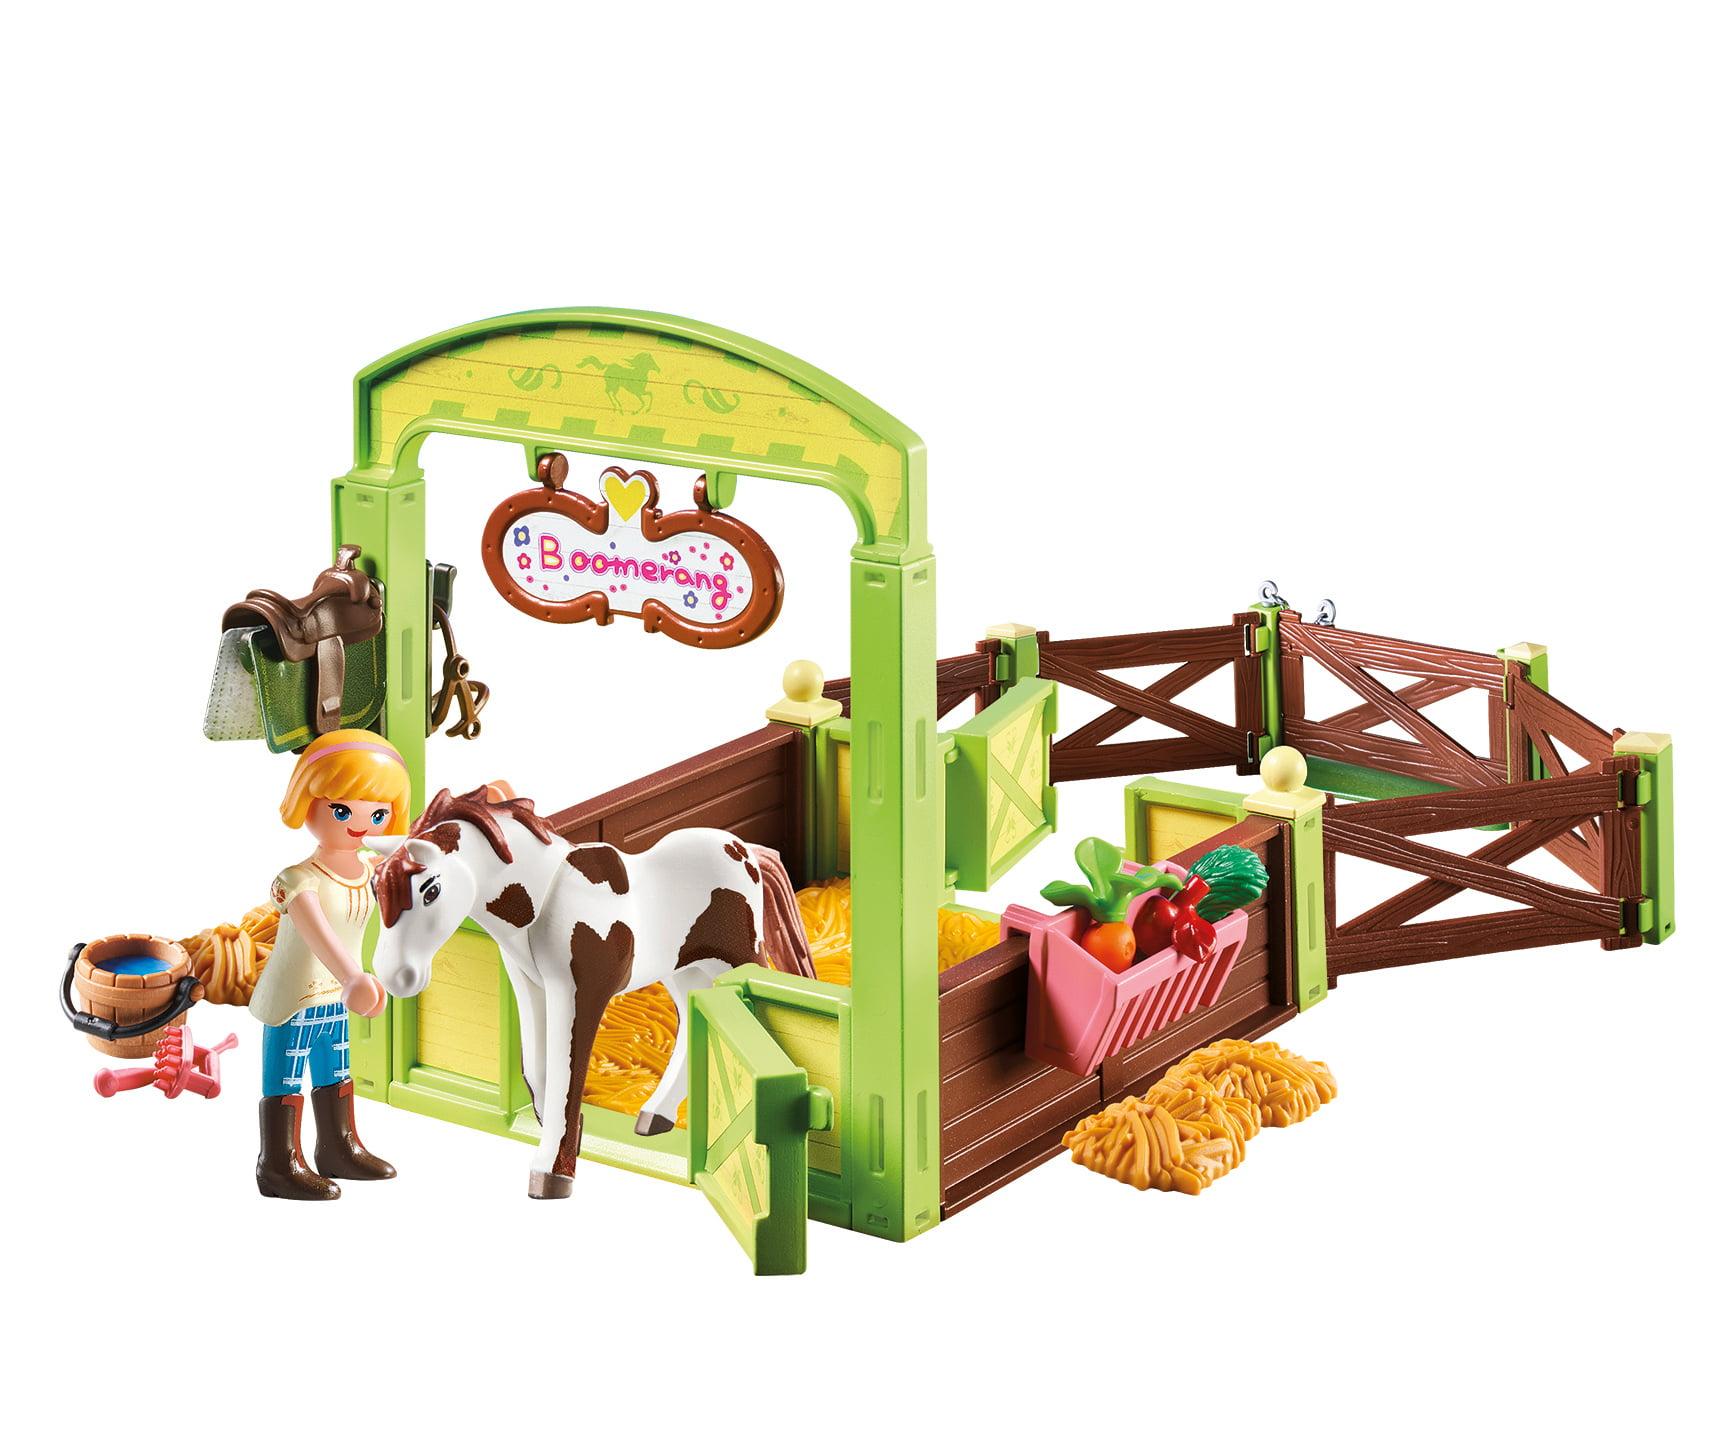 Playmobil M DreamWorks Spirit 9480 Dream Works Horse Box Abigail and Boomerang